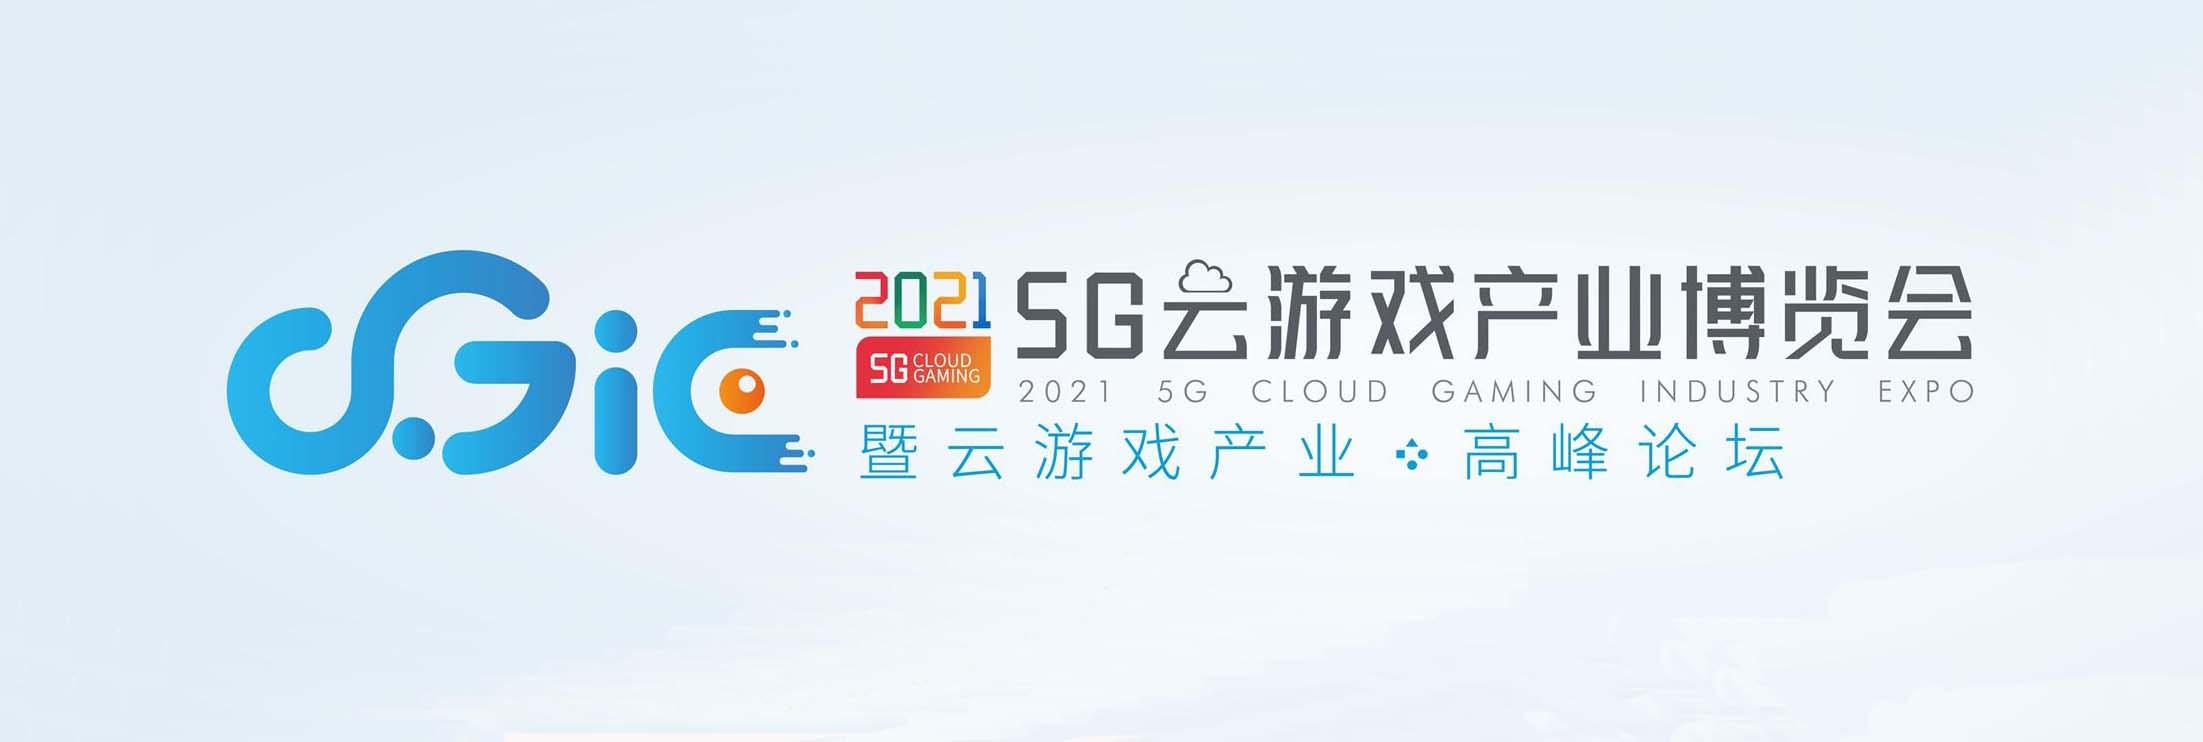 "5G云游戏产业博览会暨云游戏产业高峰论坛在福州举办 突出""数字文创"""